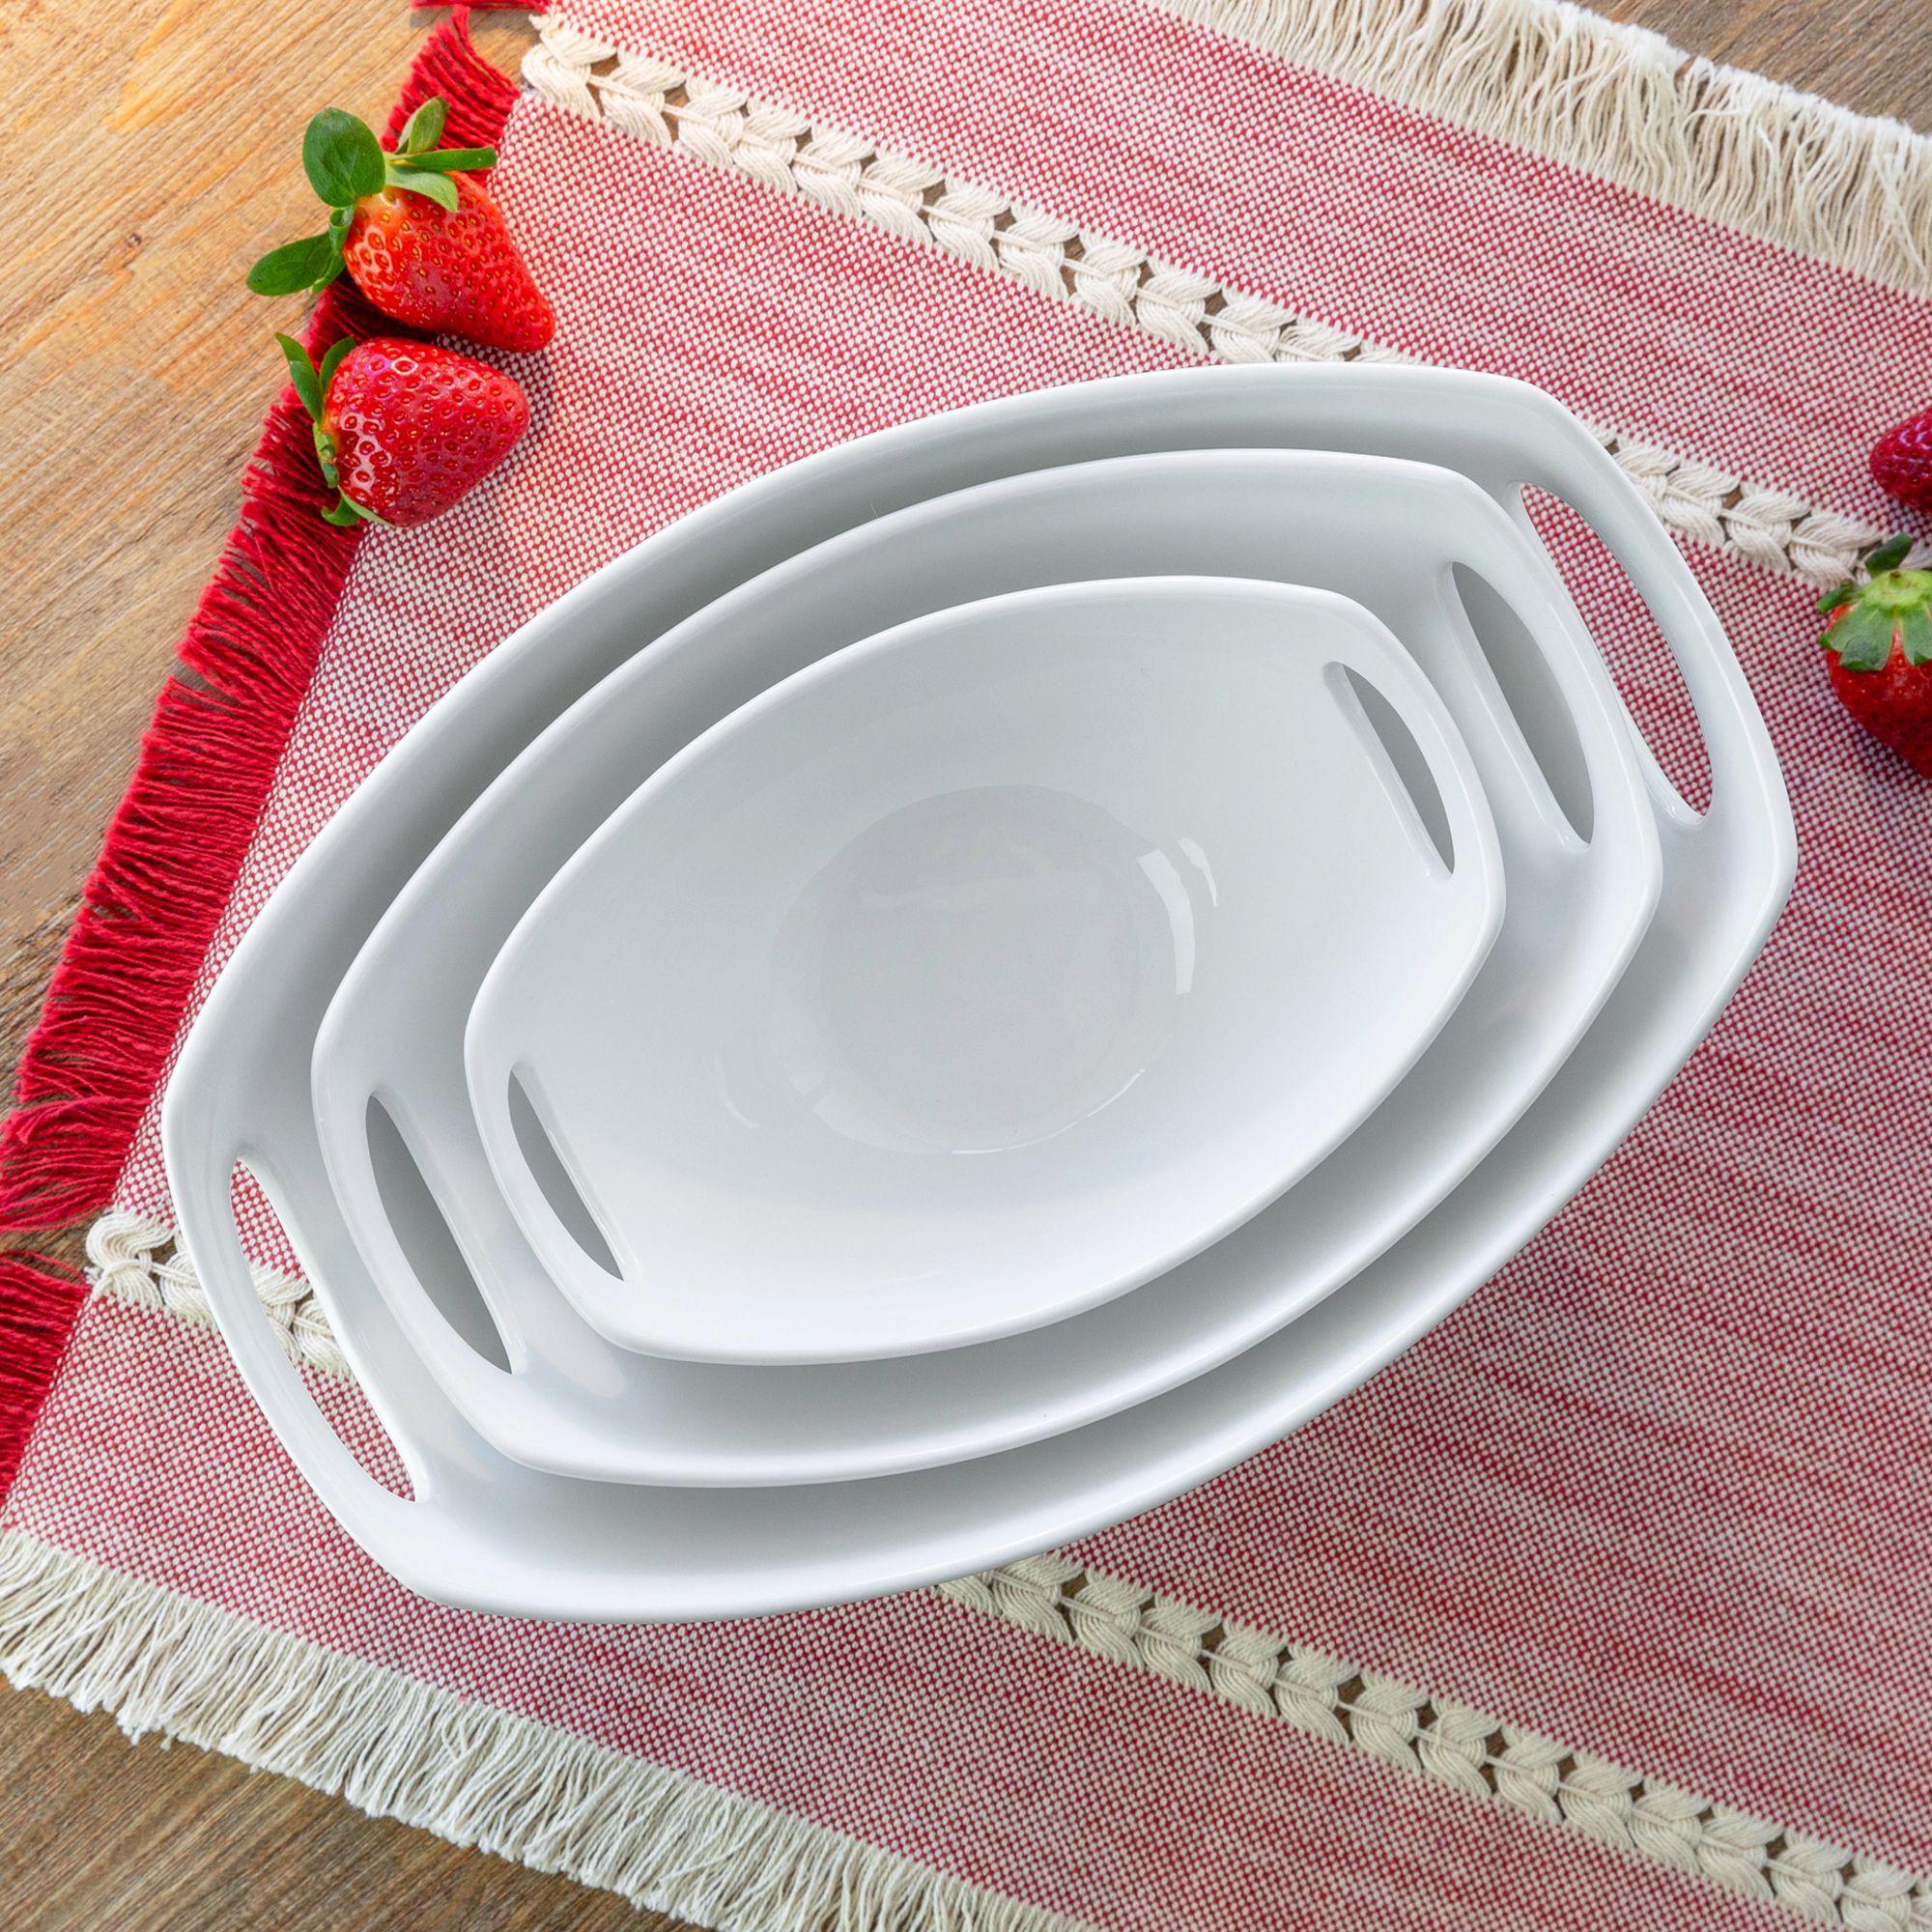 Better Homes & Gardens Porcelain Coupe Serve Bowls